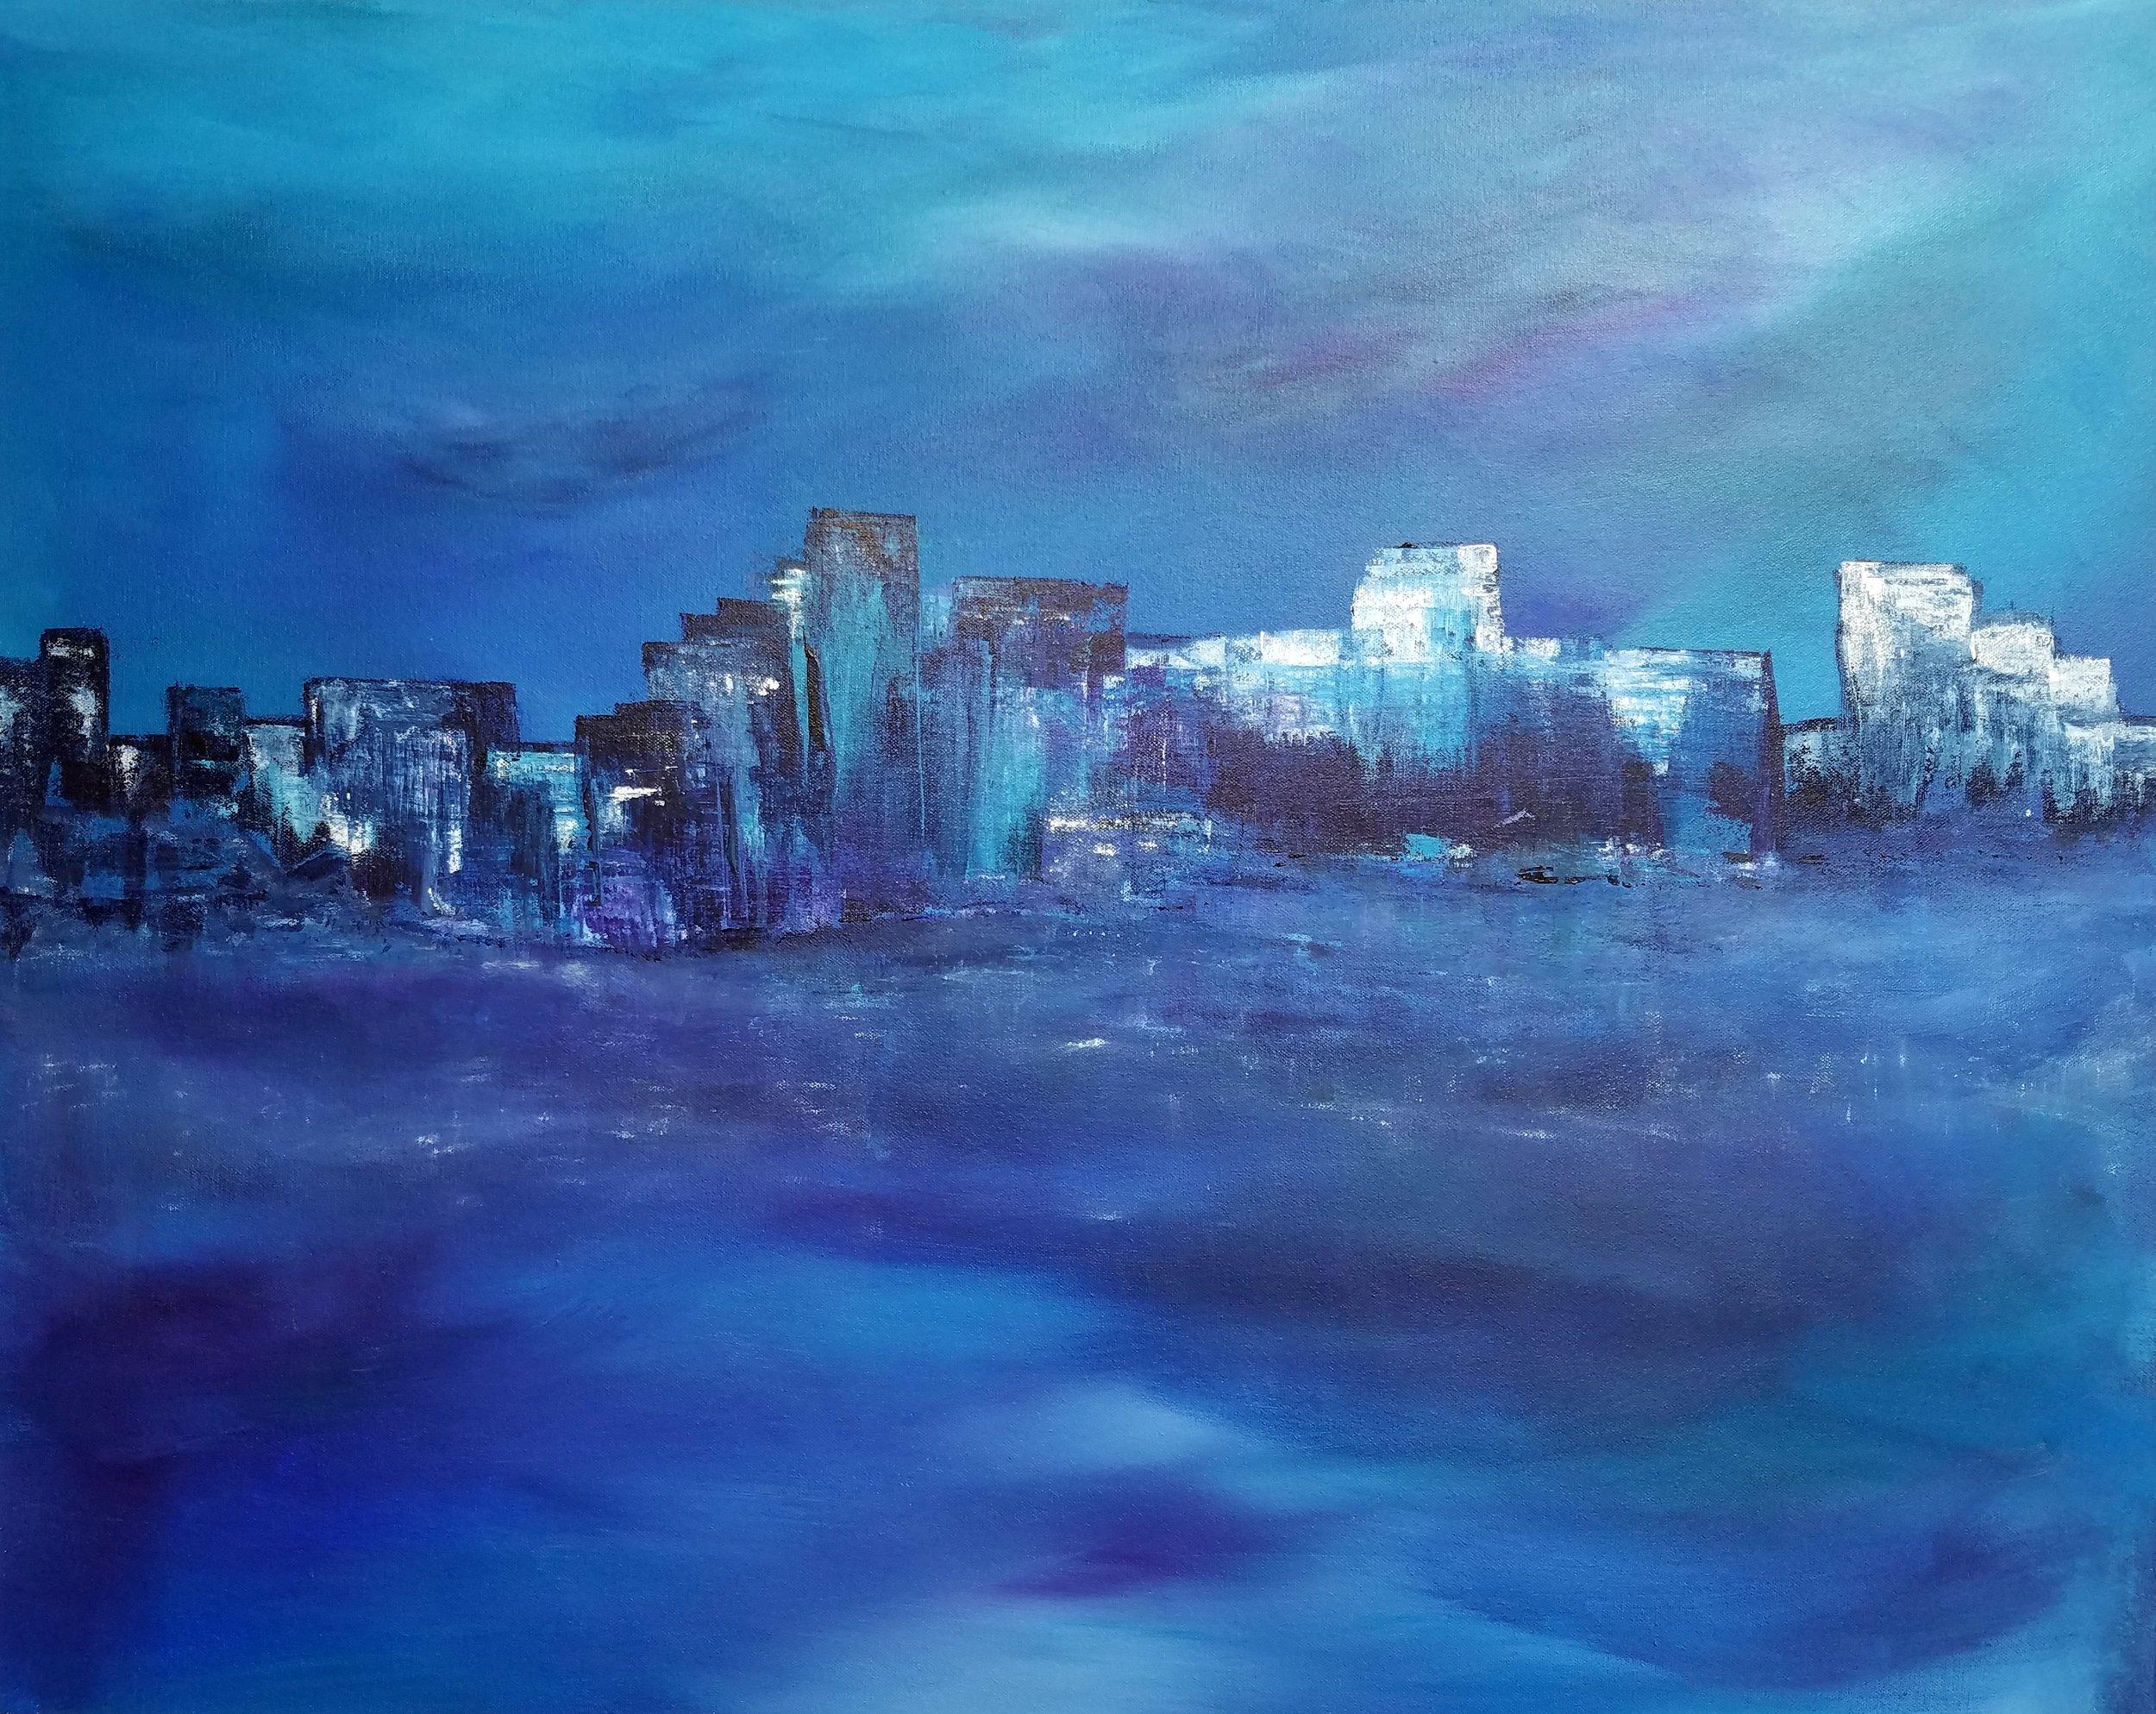 Stormy Night - 24 x 30 x 1.5, acrylic  (c) Linda Wimberly 2018